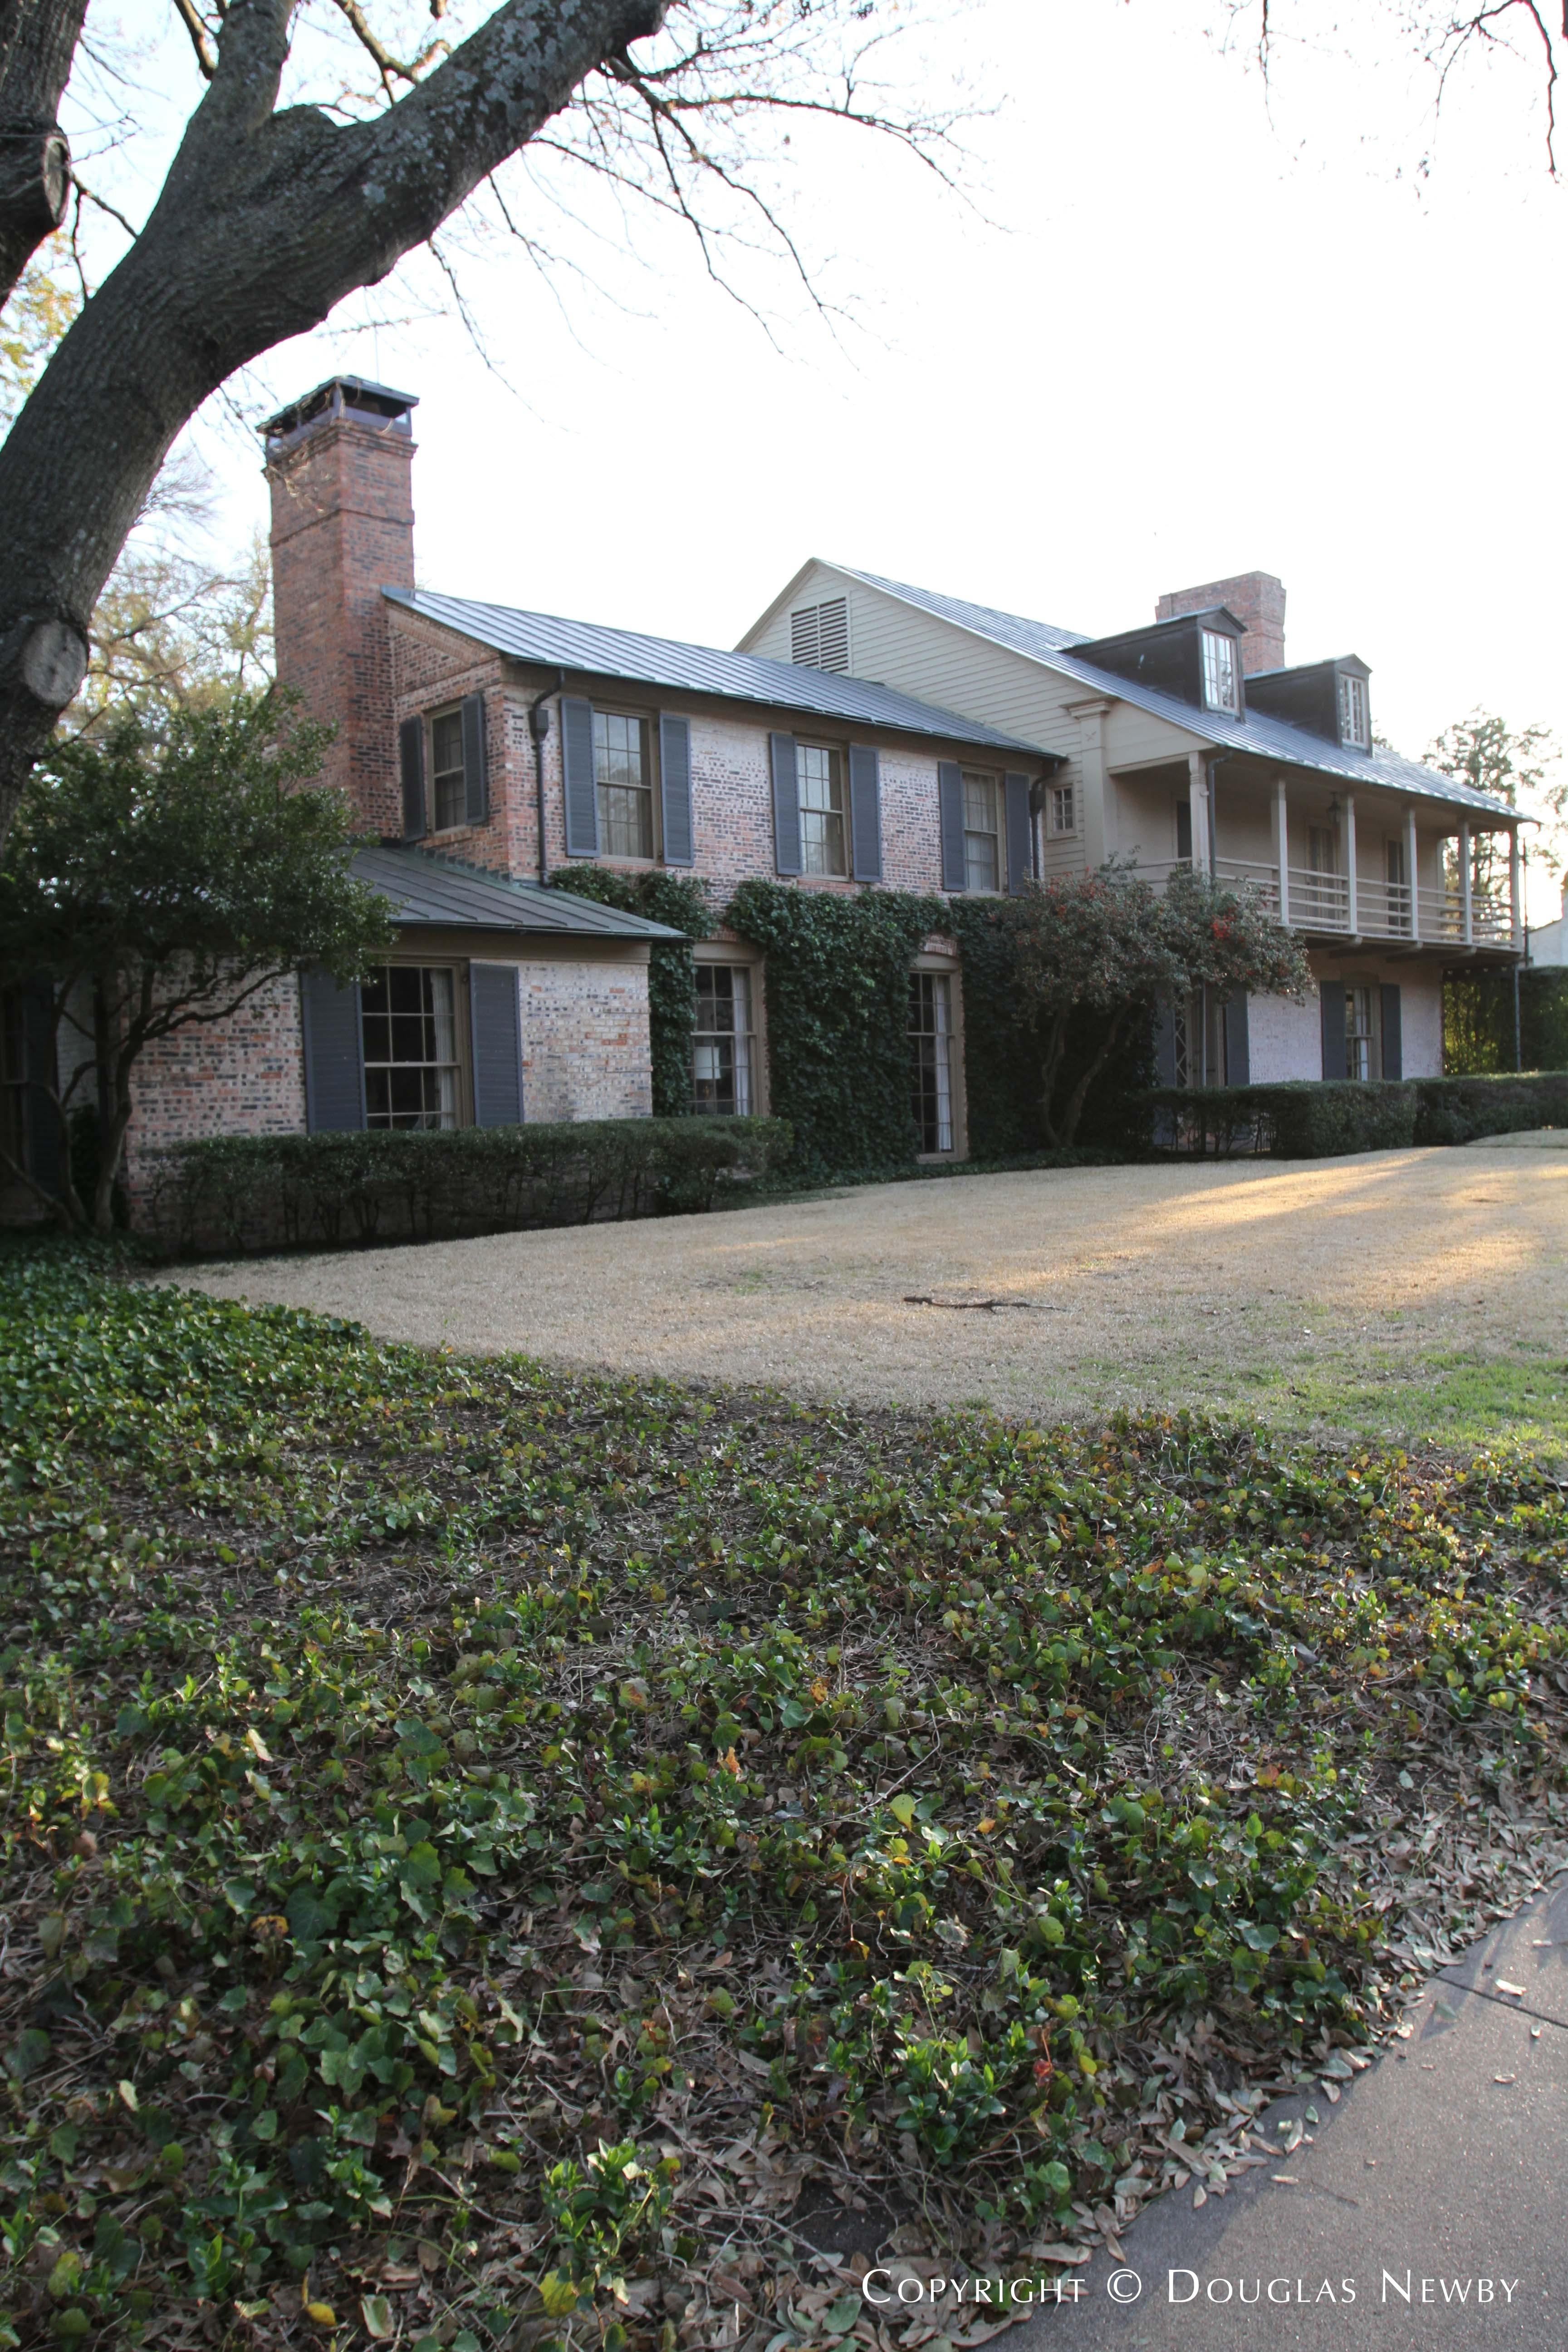 University Park Real Estate on 1.15 Acres